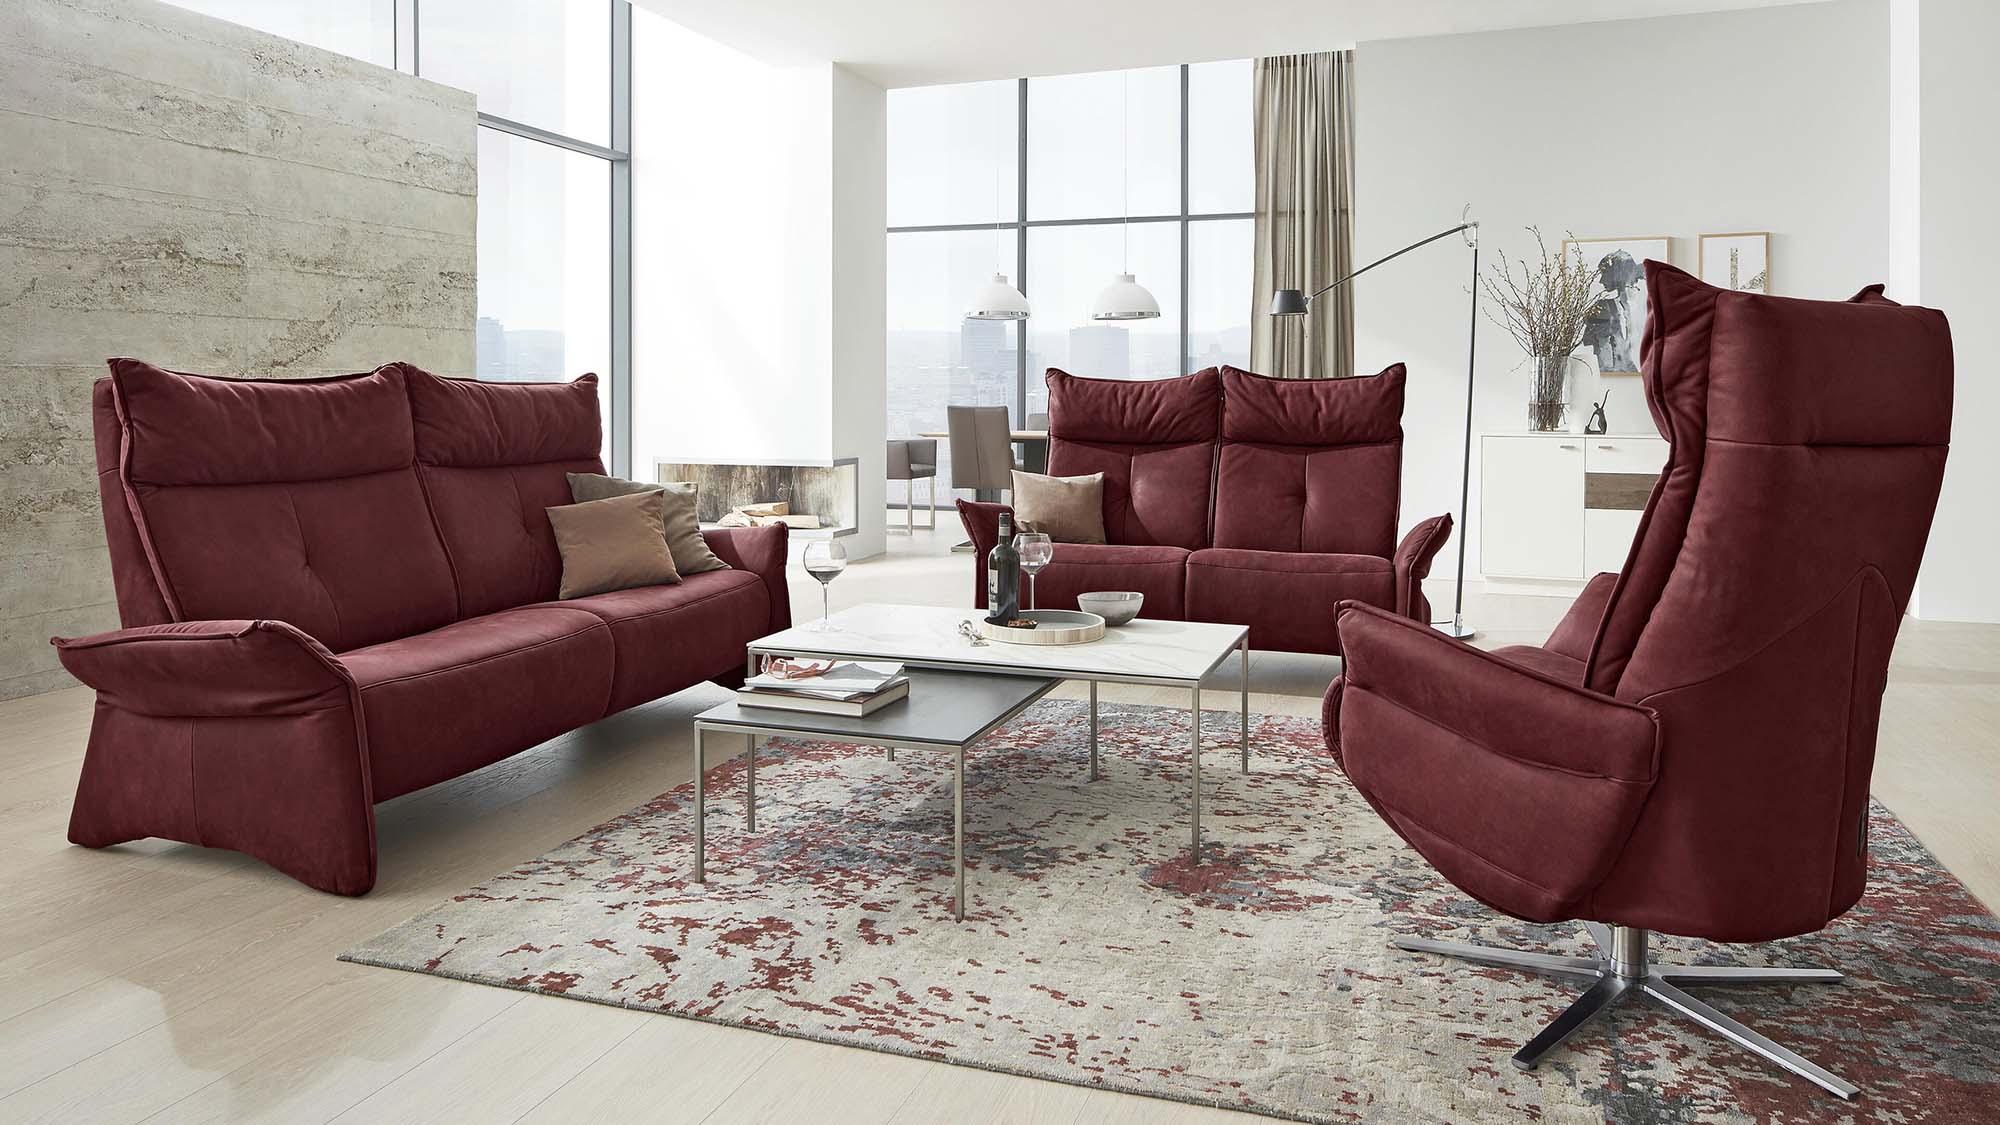 4200 Sofagruppe mit 4500 Sessel